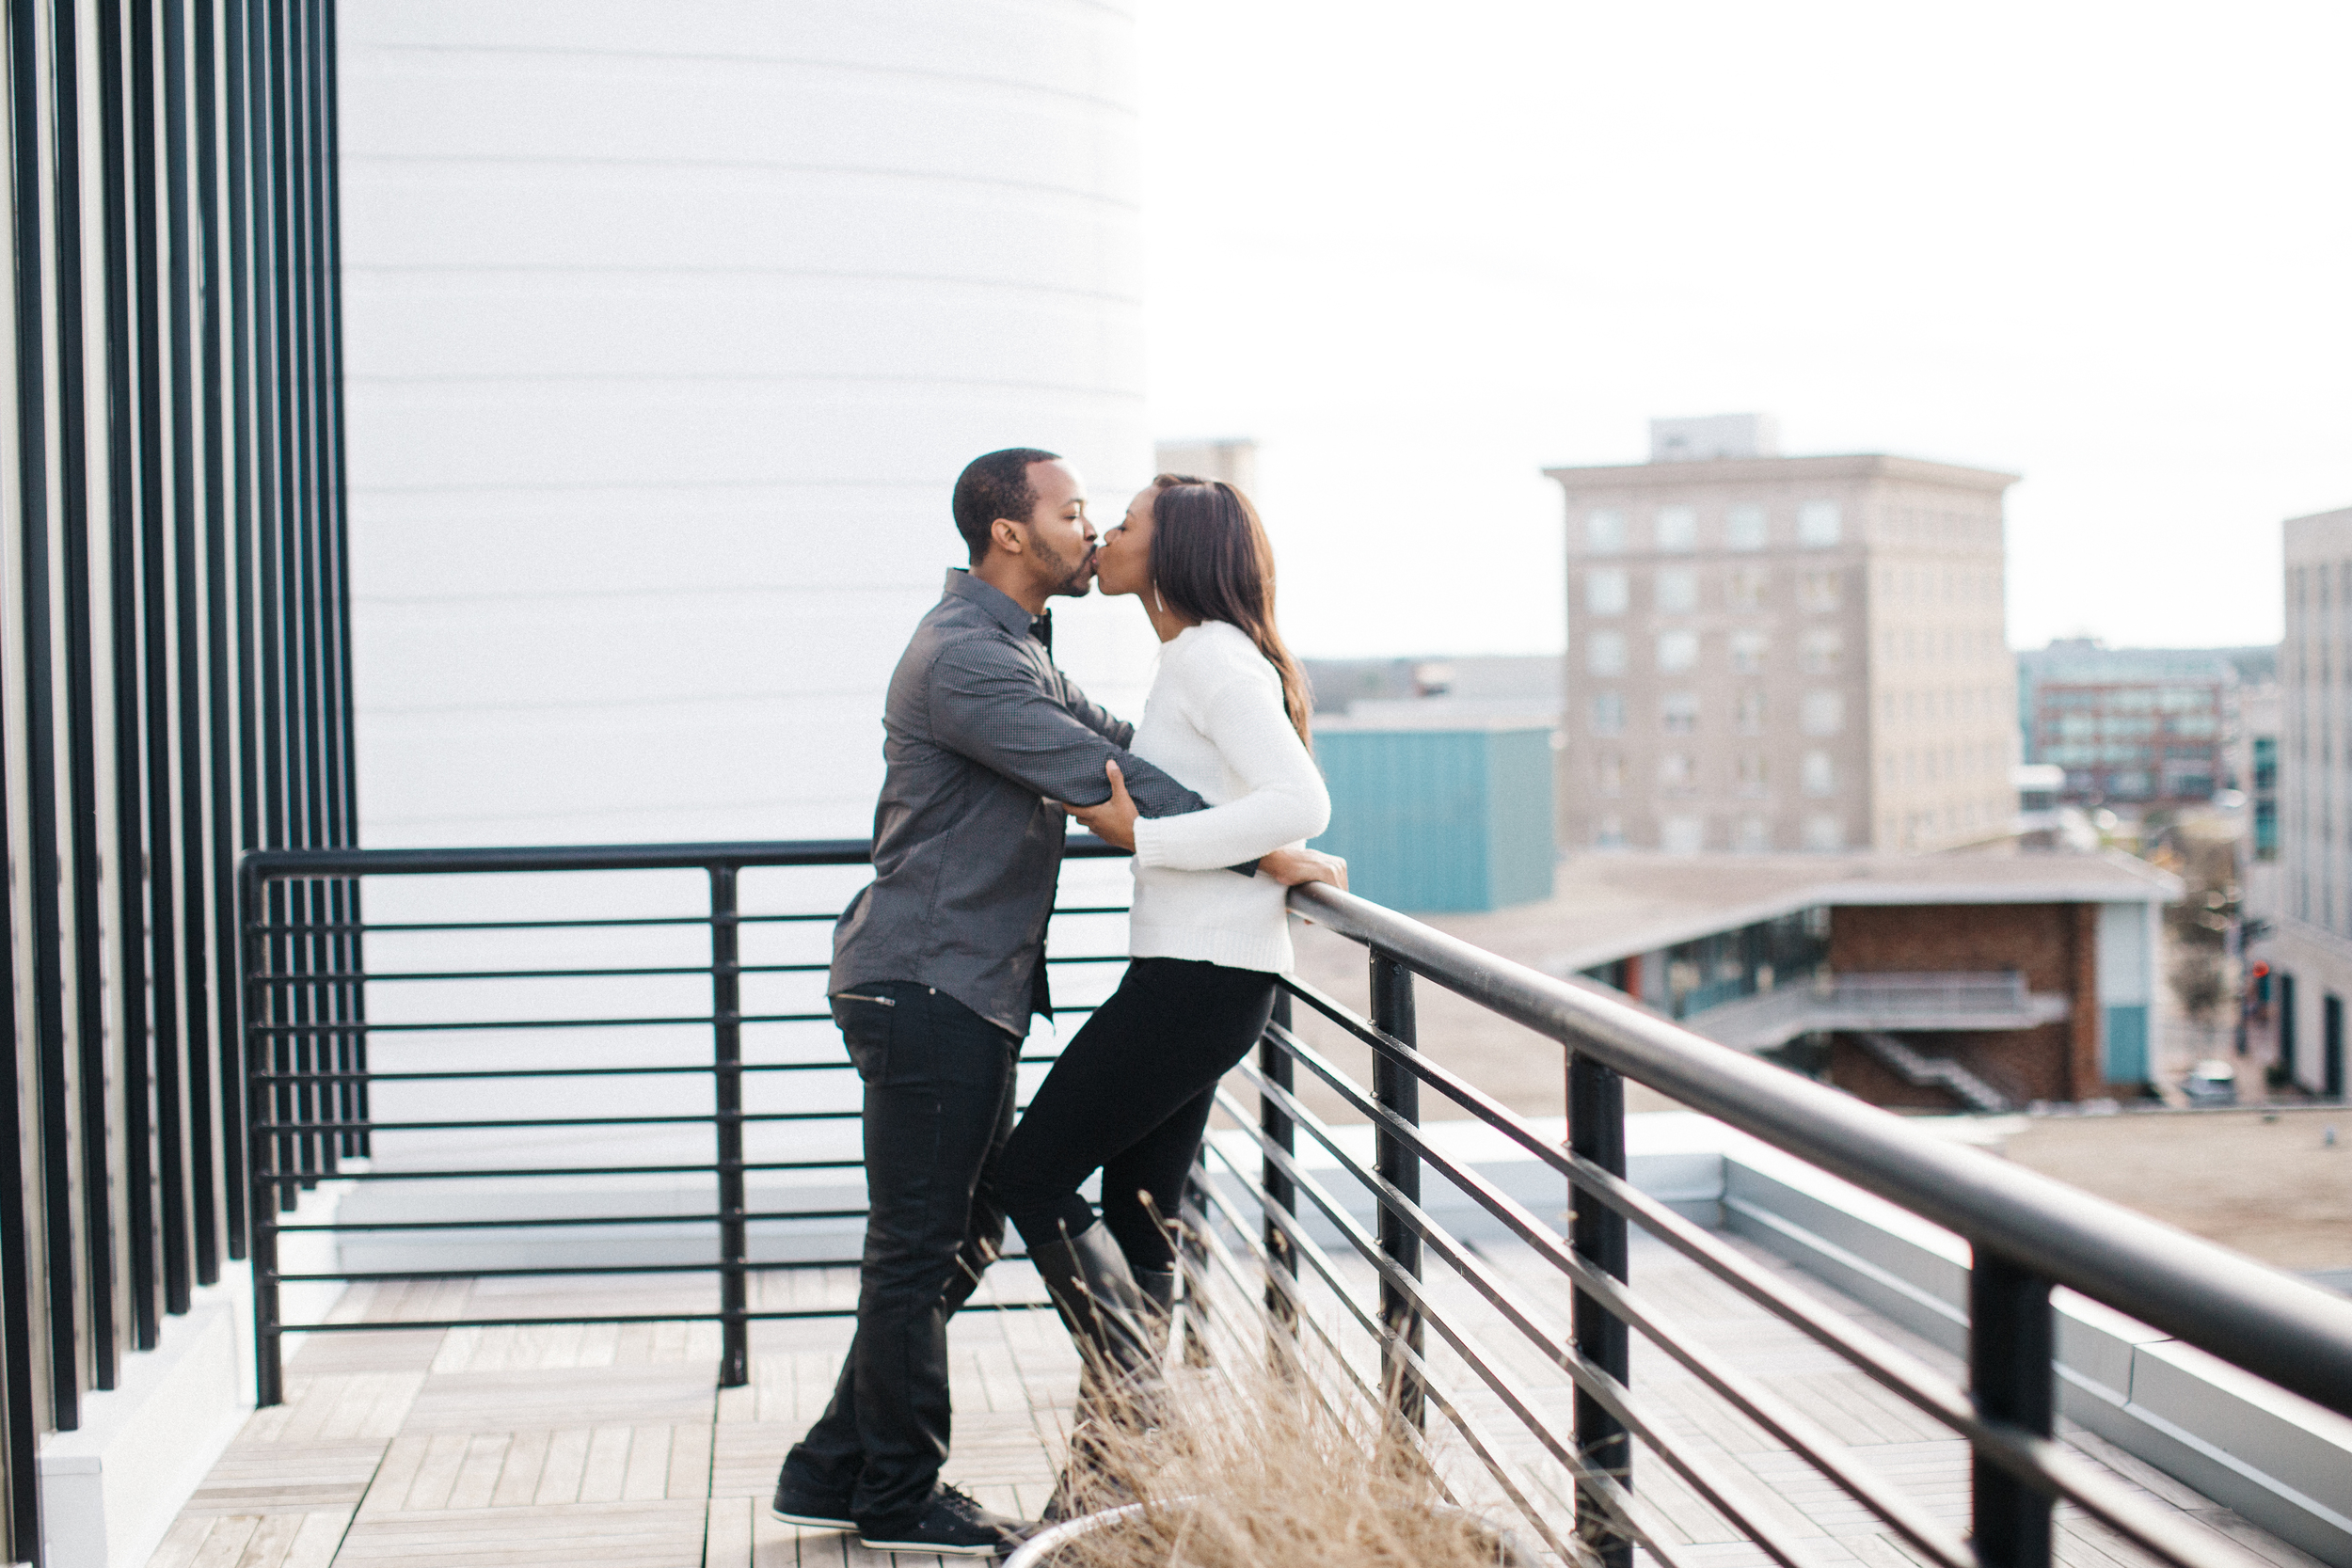 durham_hotel_rooftop_kiss